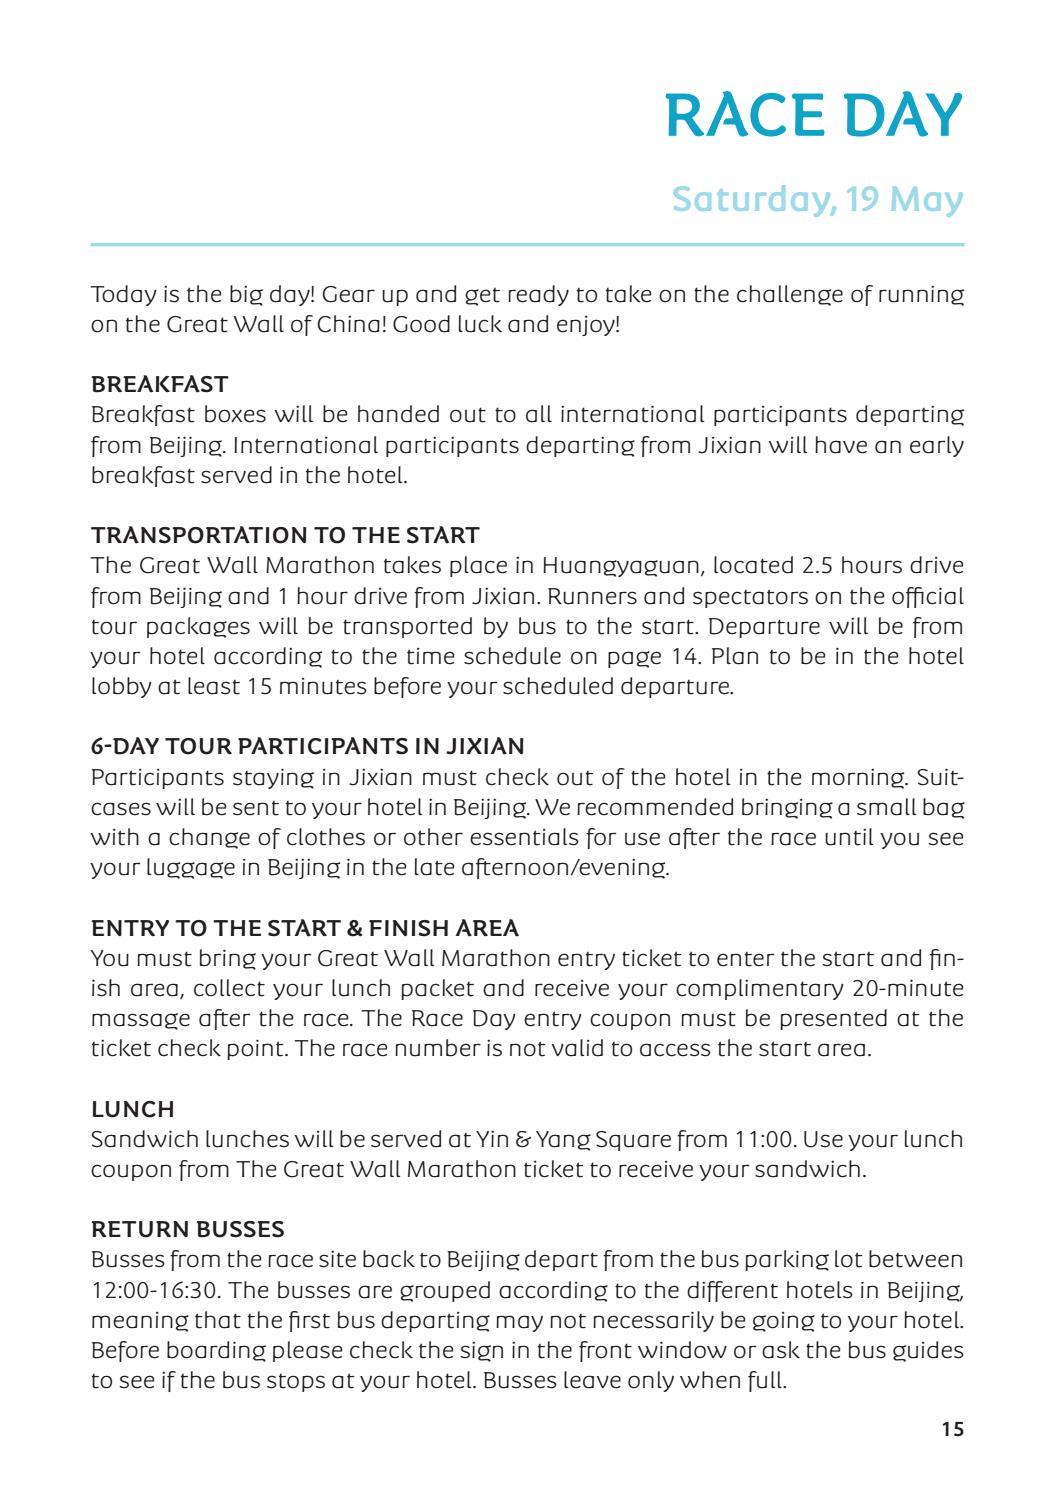 Great Wall Marathon Runners Guide 2018 By Albatros Travel Issuu